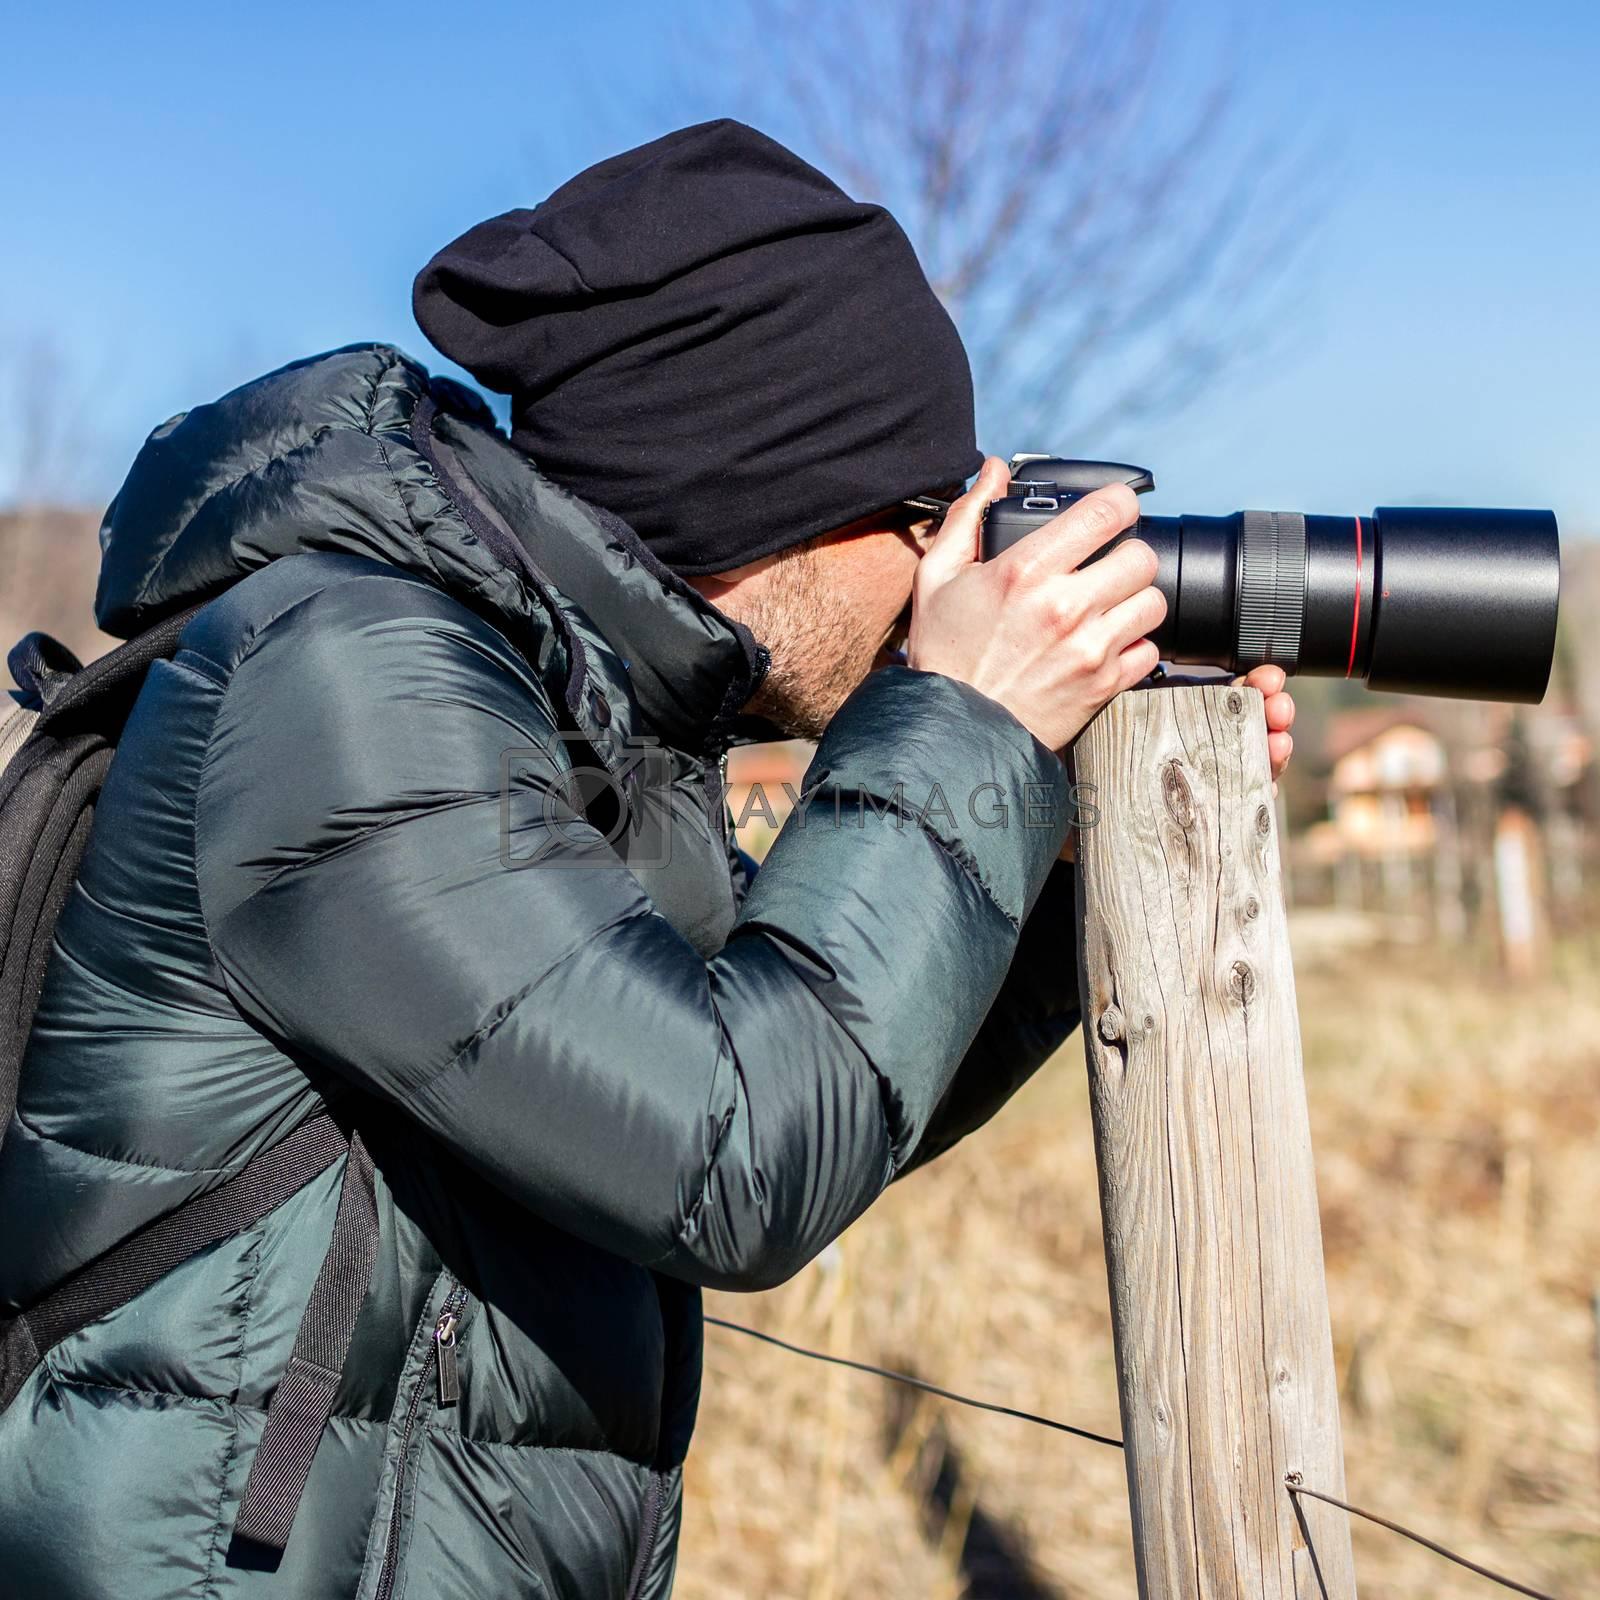 Closeup of photographer with digital camera outdoors. Young man photographer photographing nature. Shallow DOF.